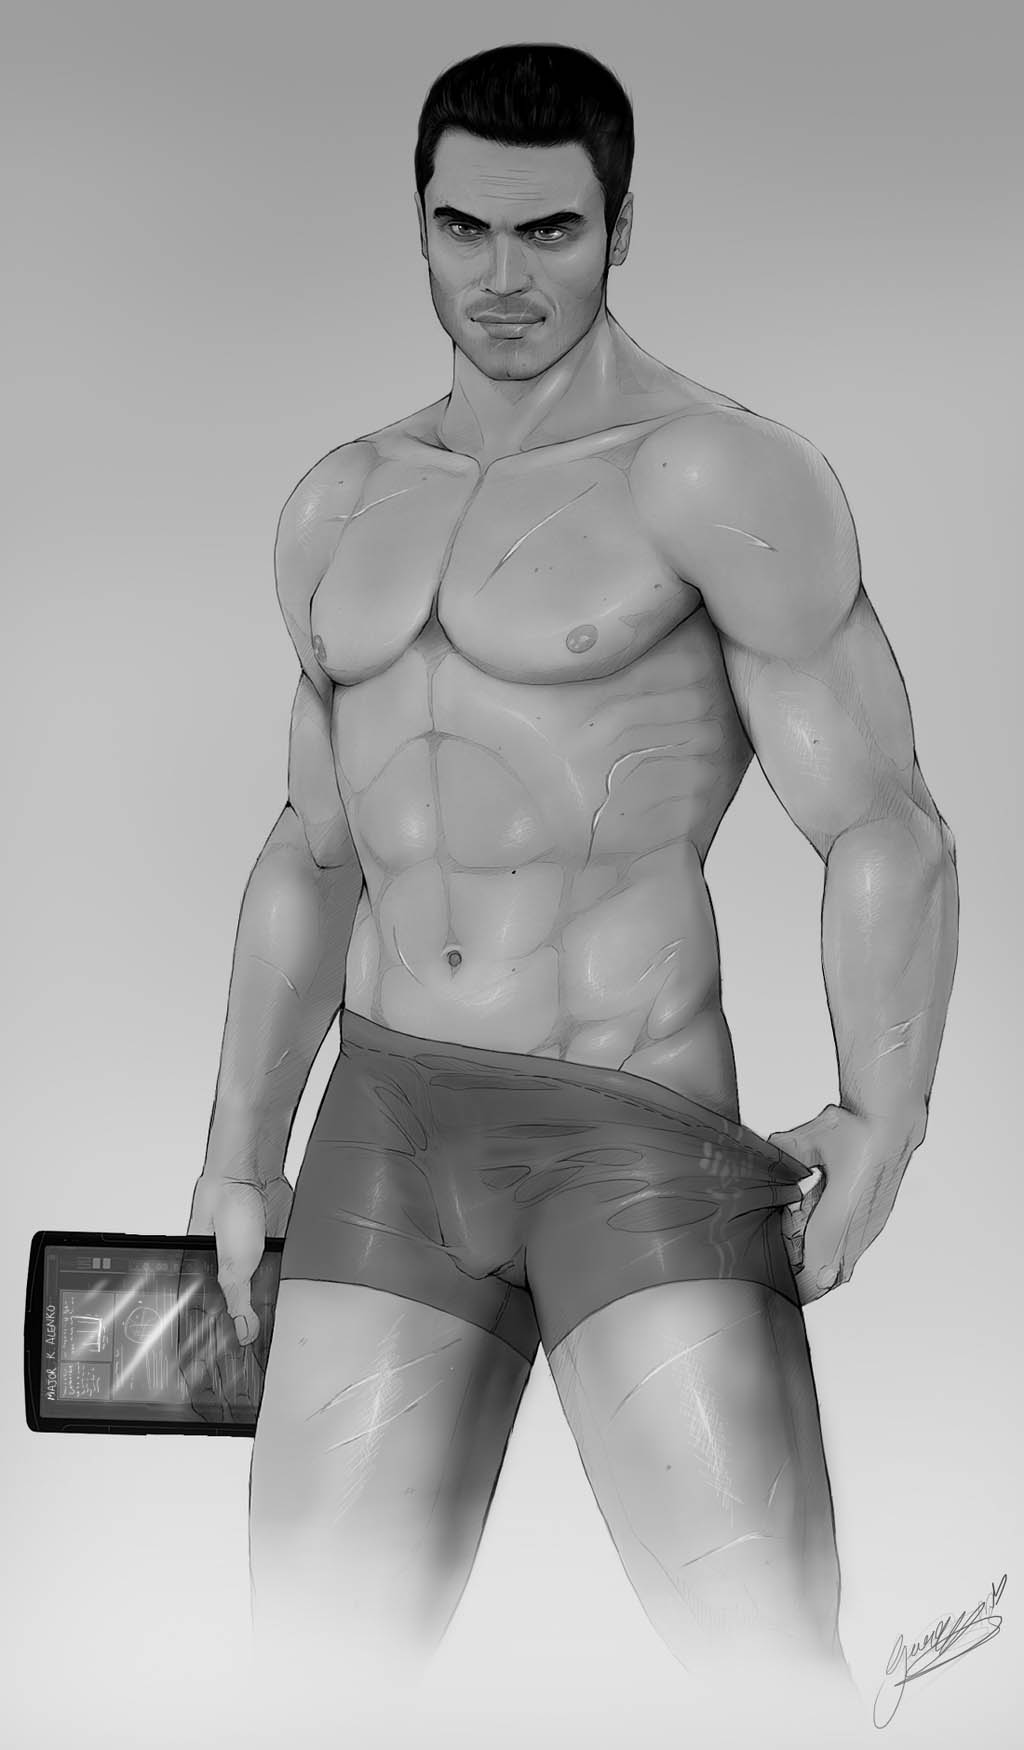 Mass effect 3 nude cheats sexy scenes